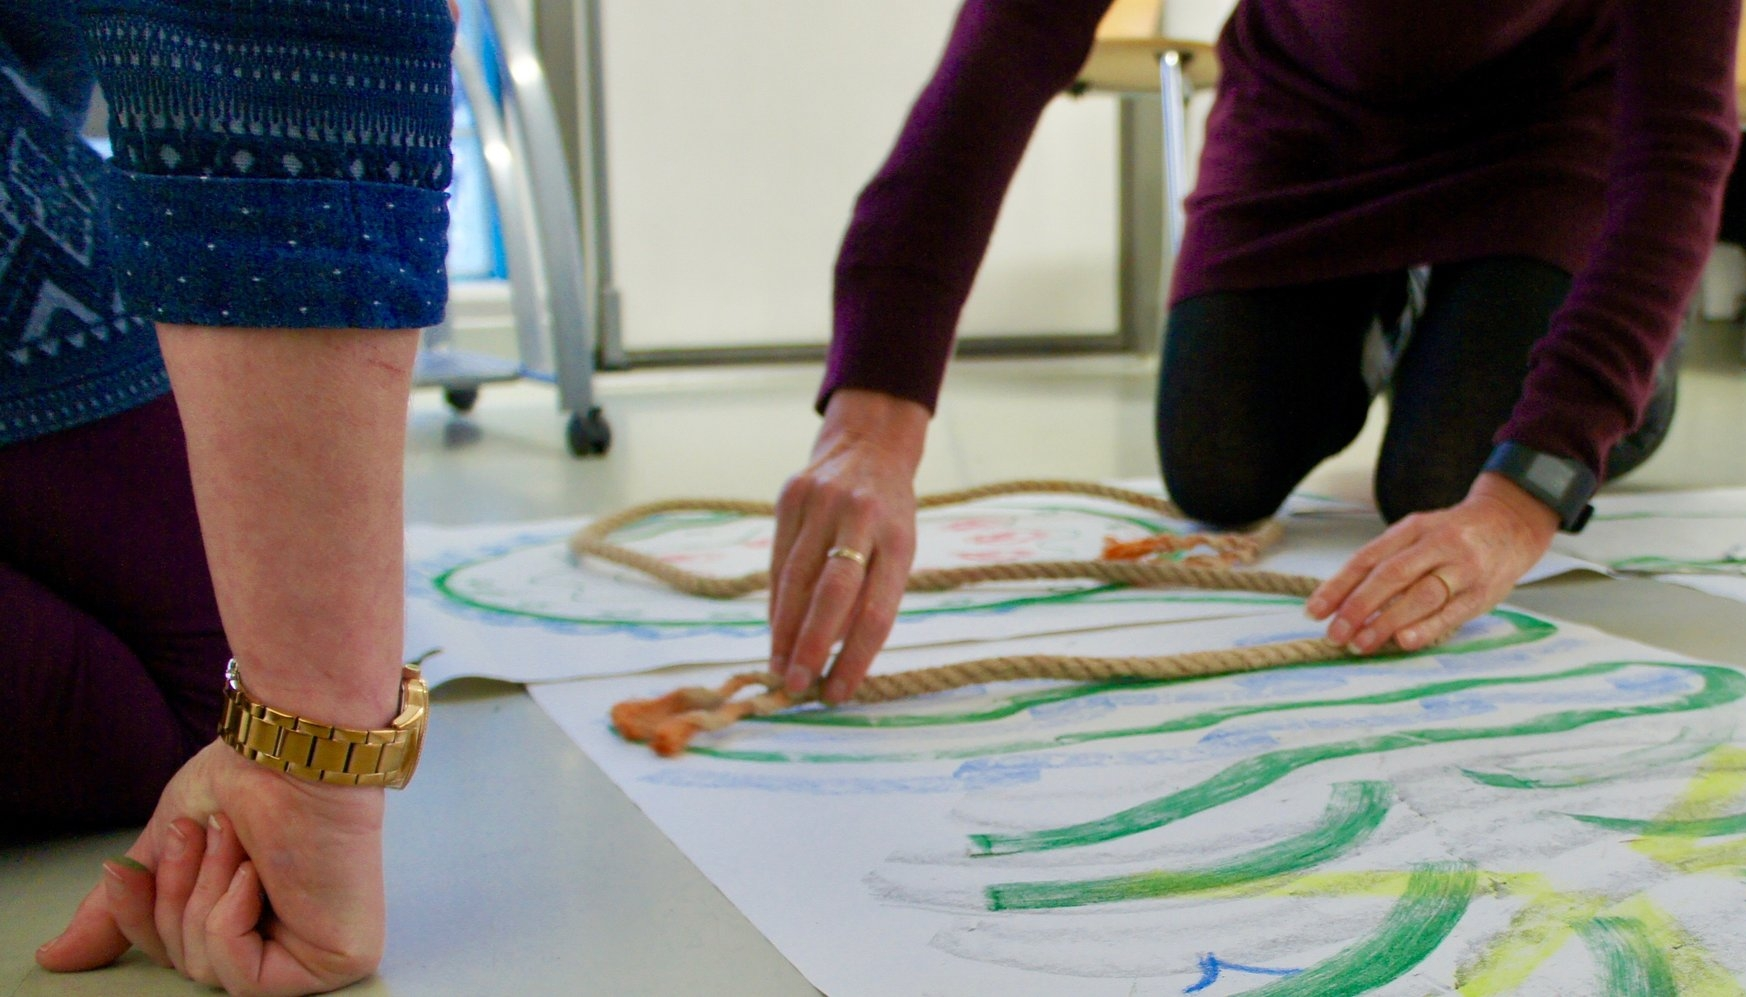 Michael Harvey storyteller - practical creativity for teachers